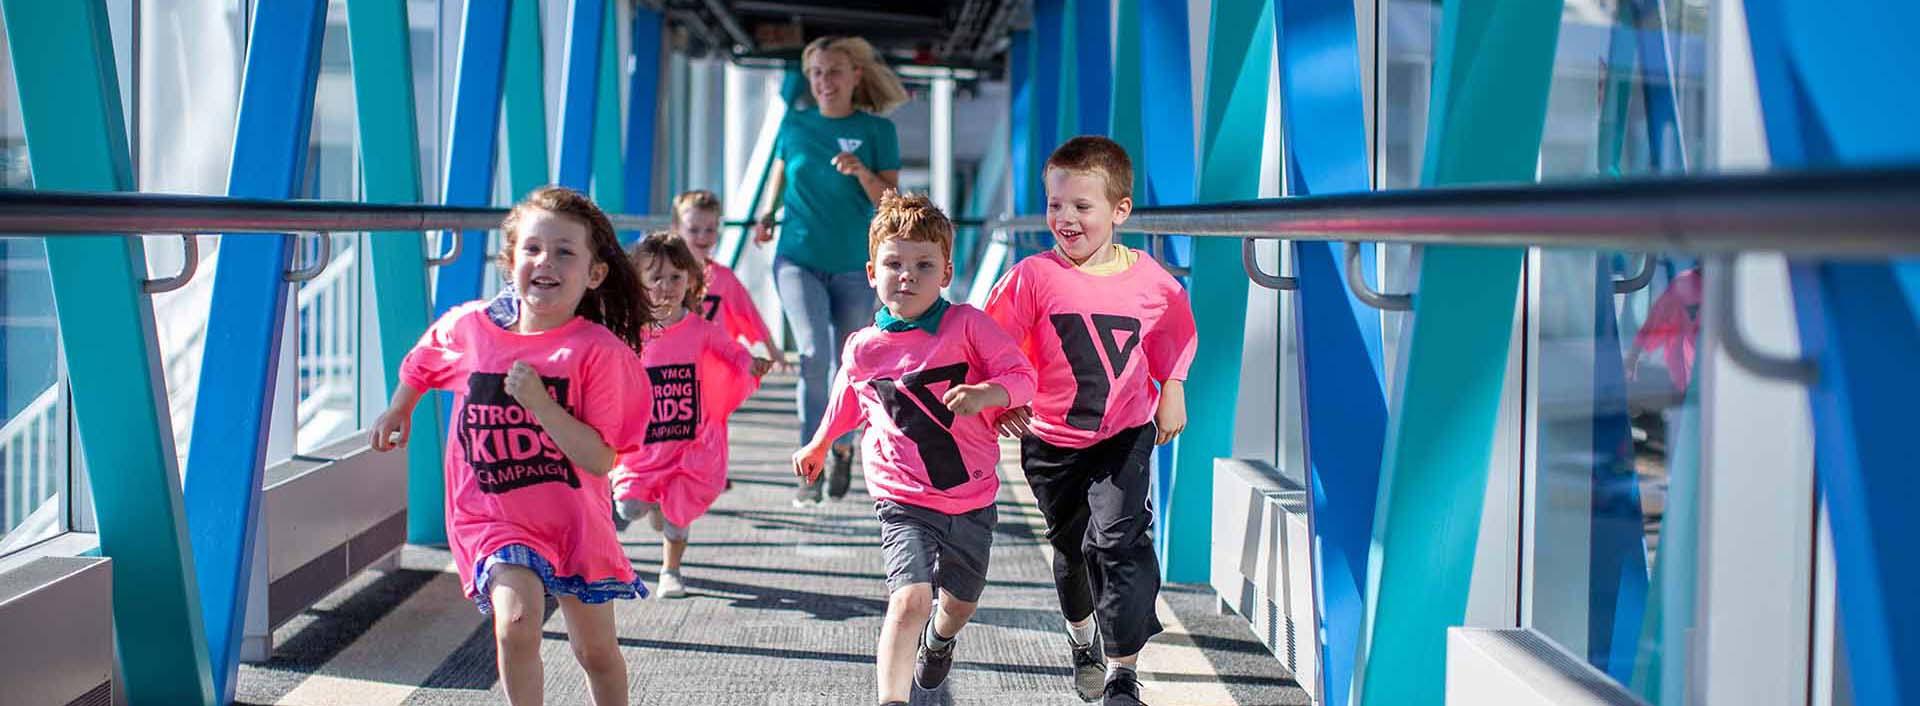 happy children runing